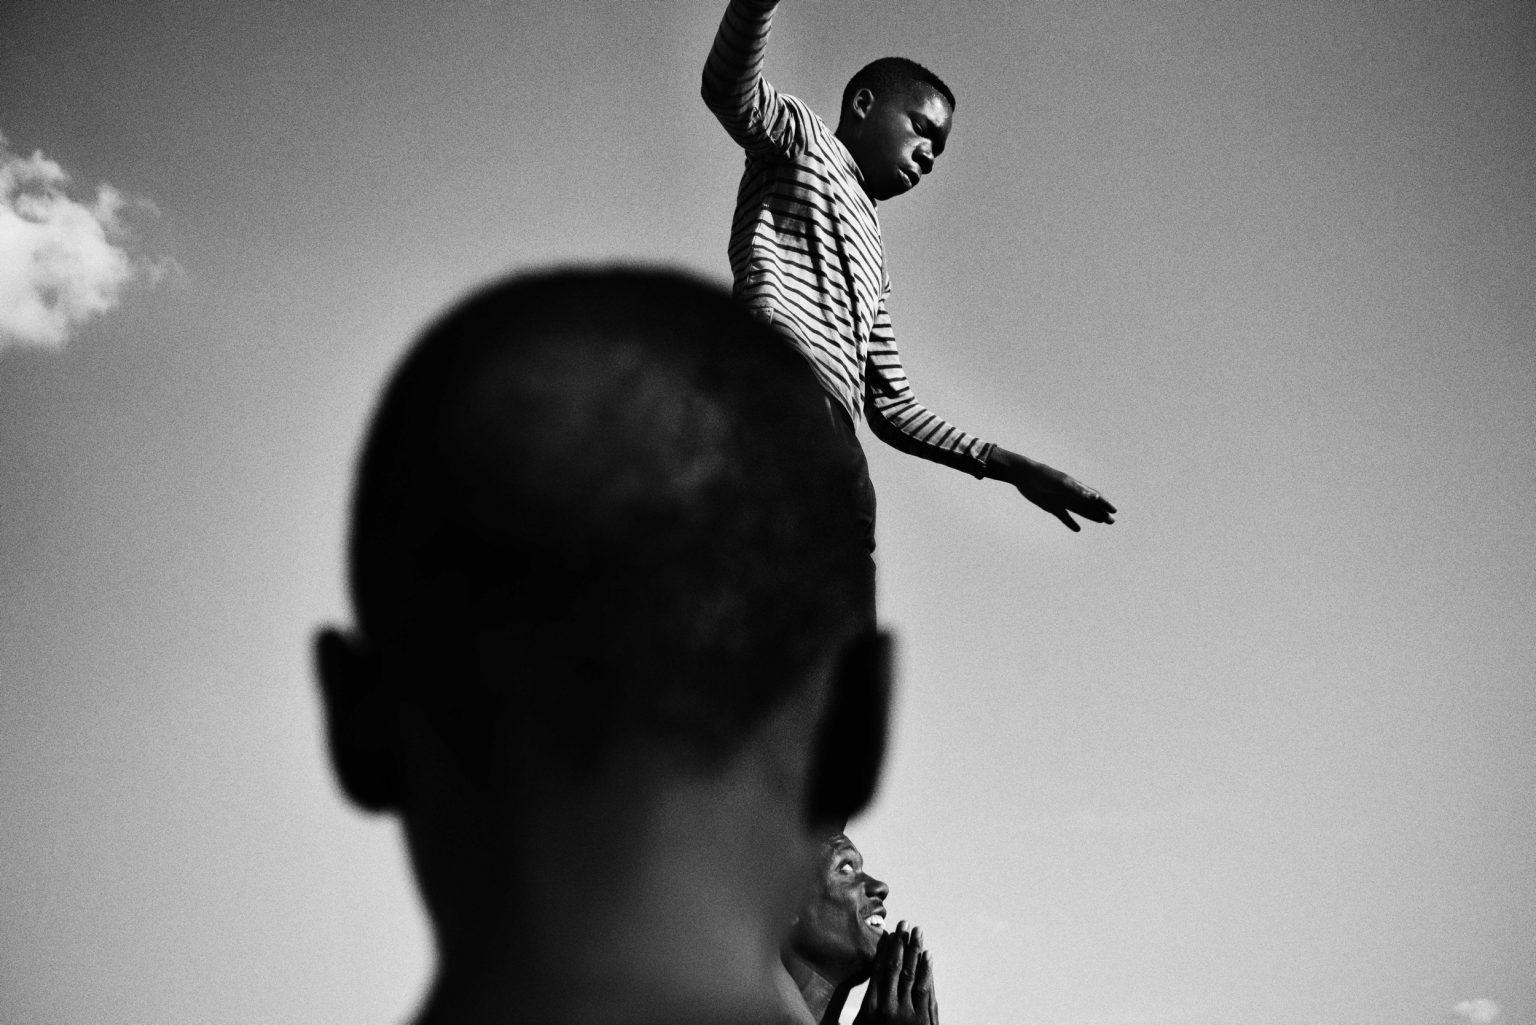 The human tower: Mthunzi's acrobats practice every day. Lusaka, Zambia, 2019